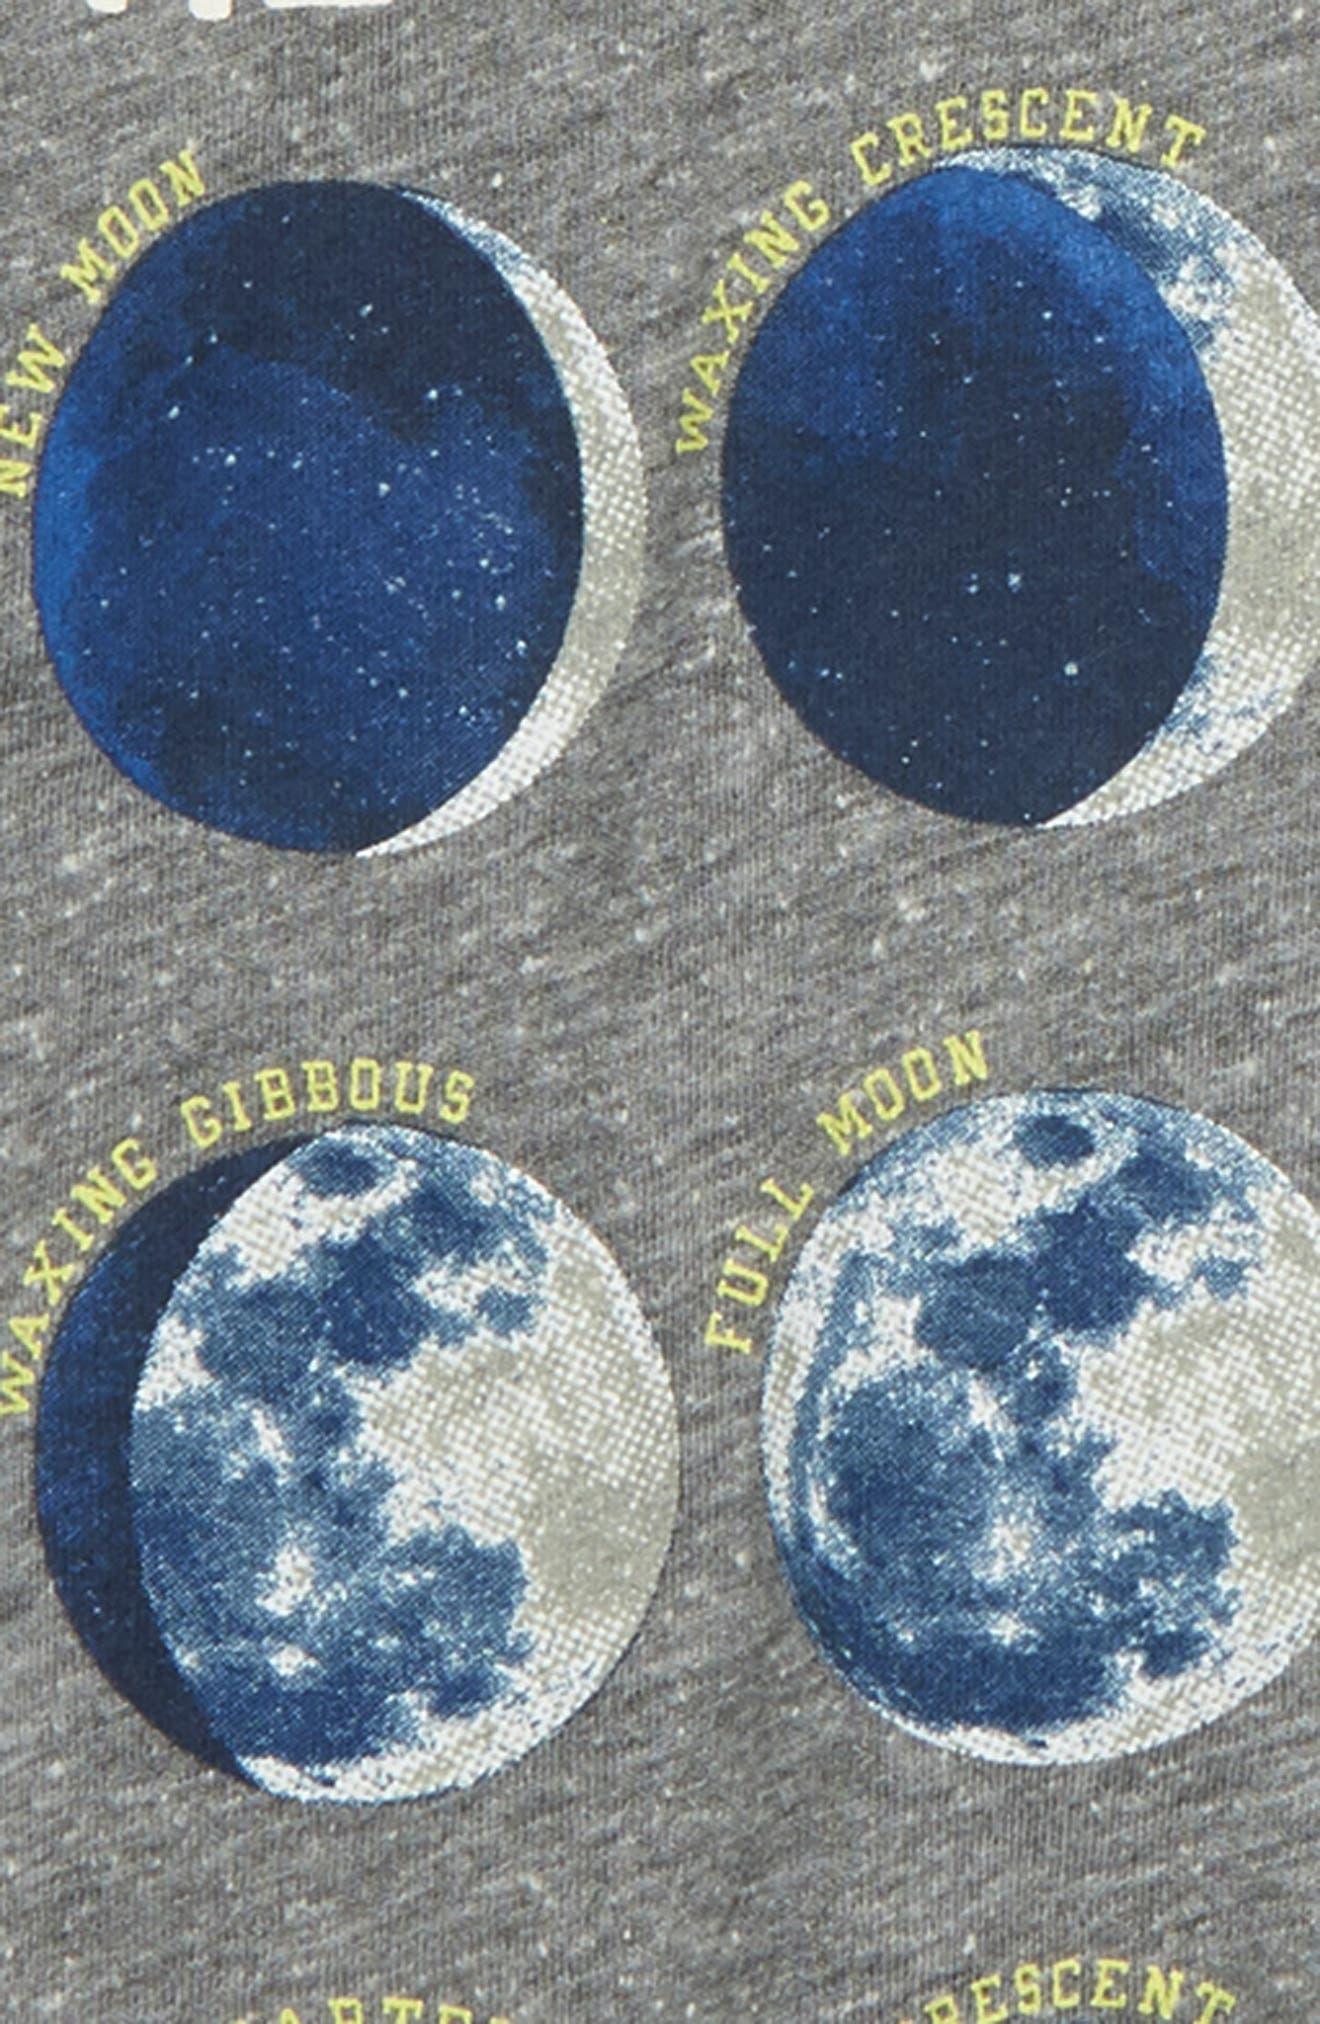 PEEK AREN'T YOU CURIOUS,                             Moon & Back Glow in the Dark Raglan T-Shirt,                             Alternate thumbnail 3, color,                             020